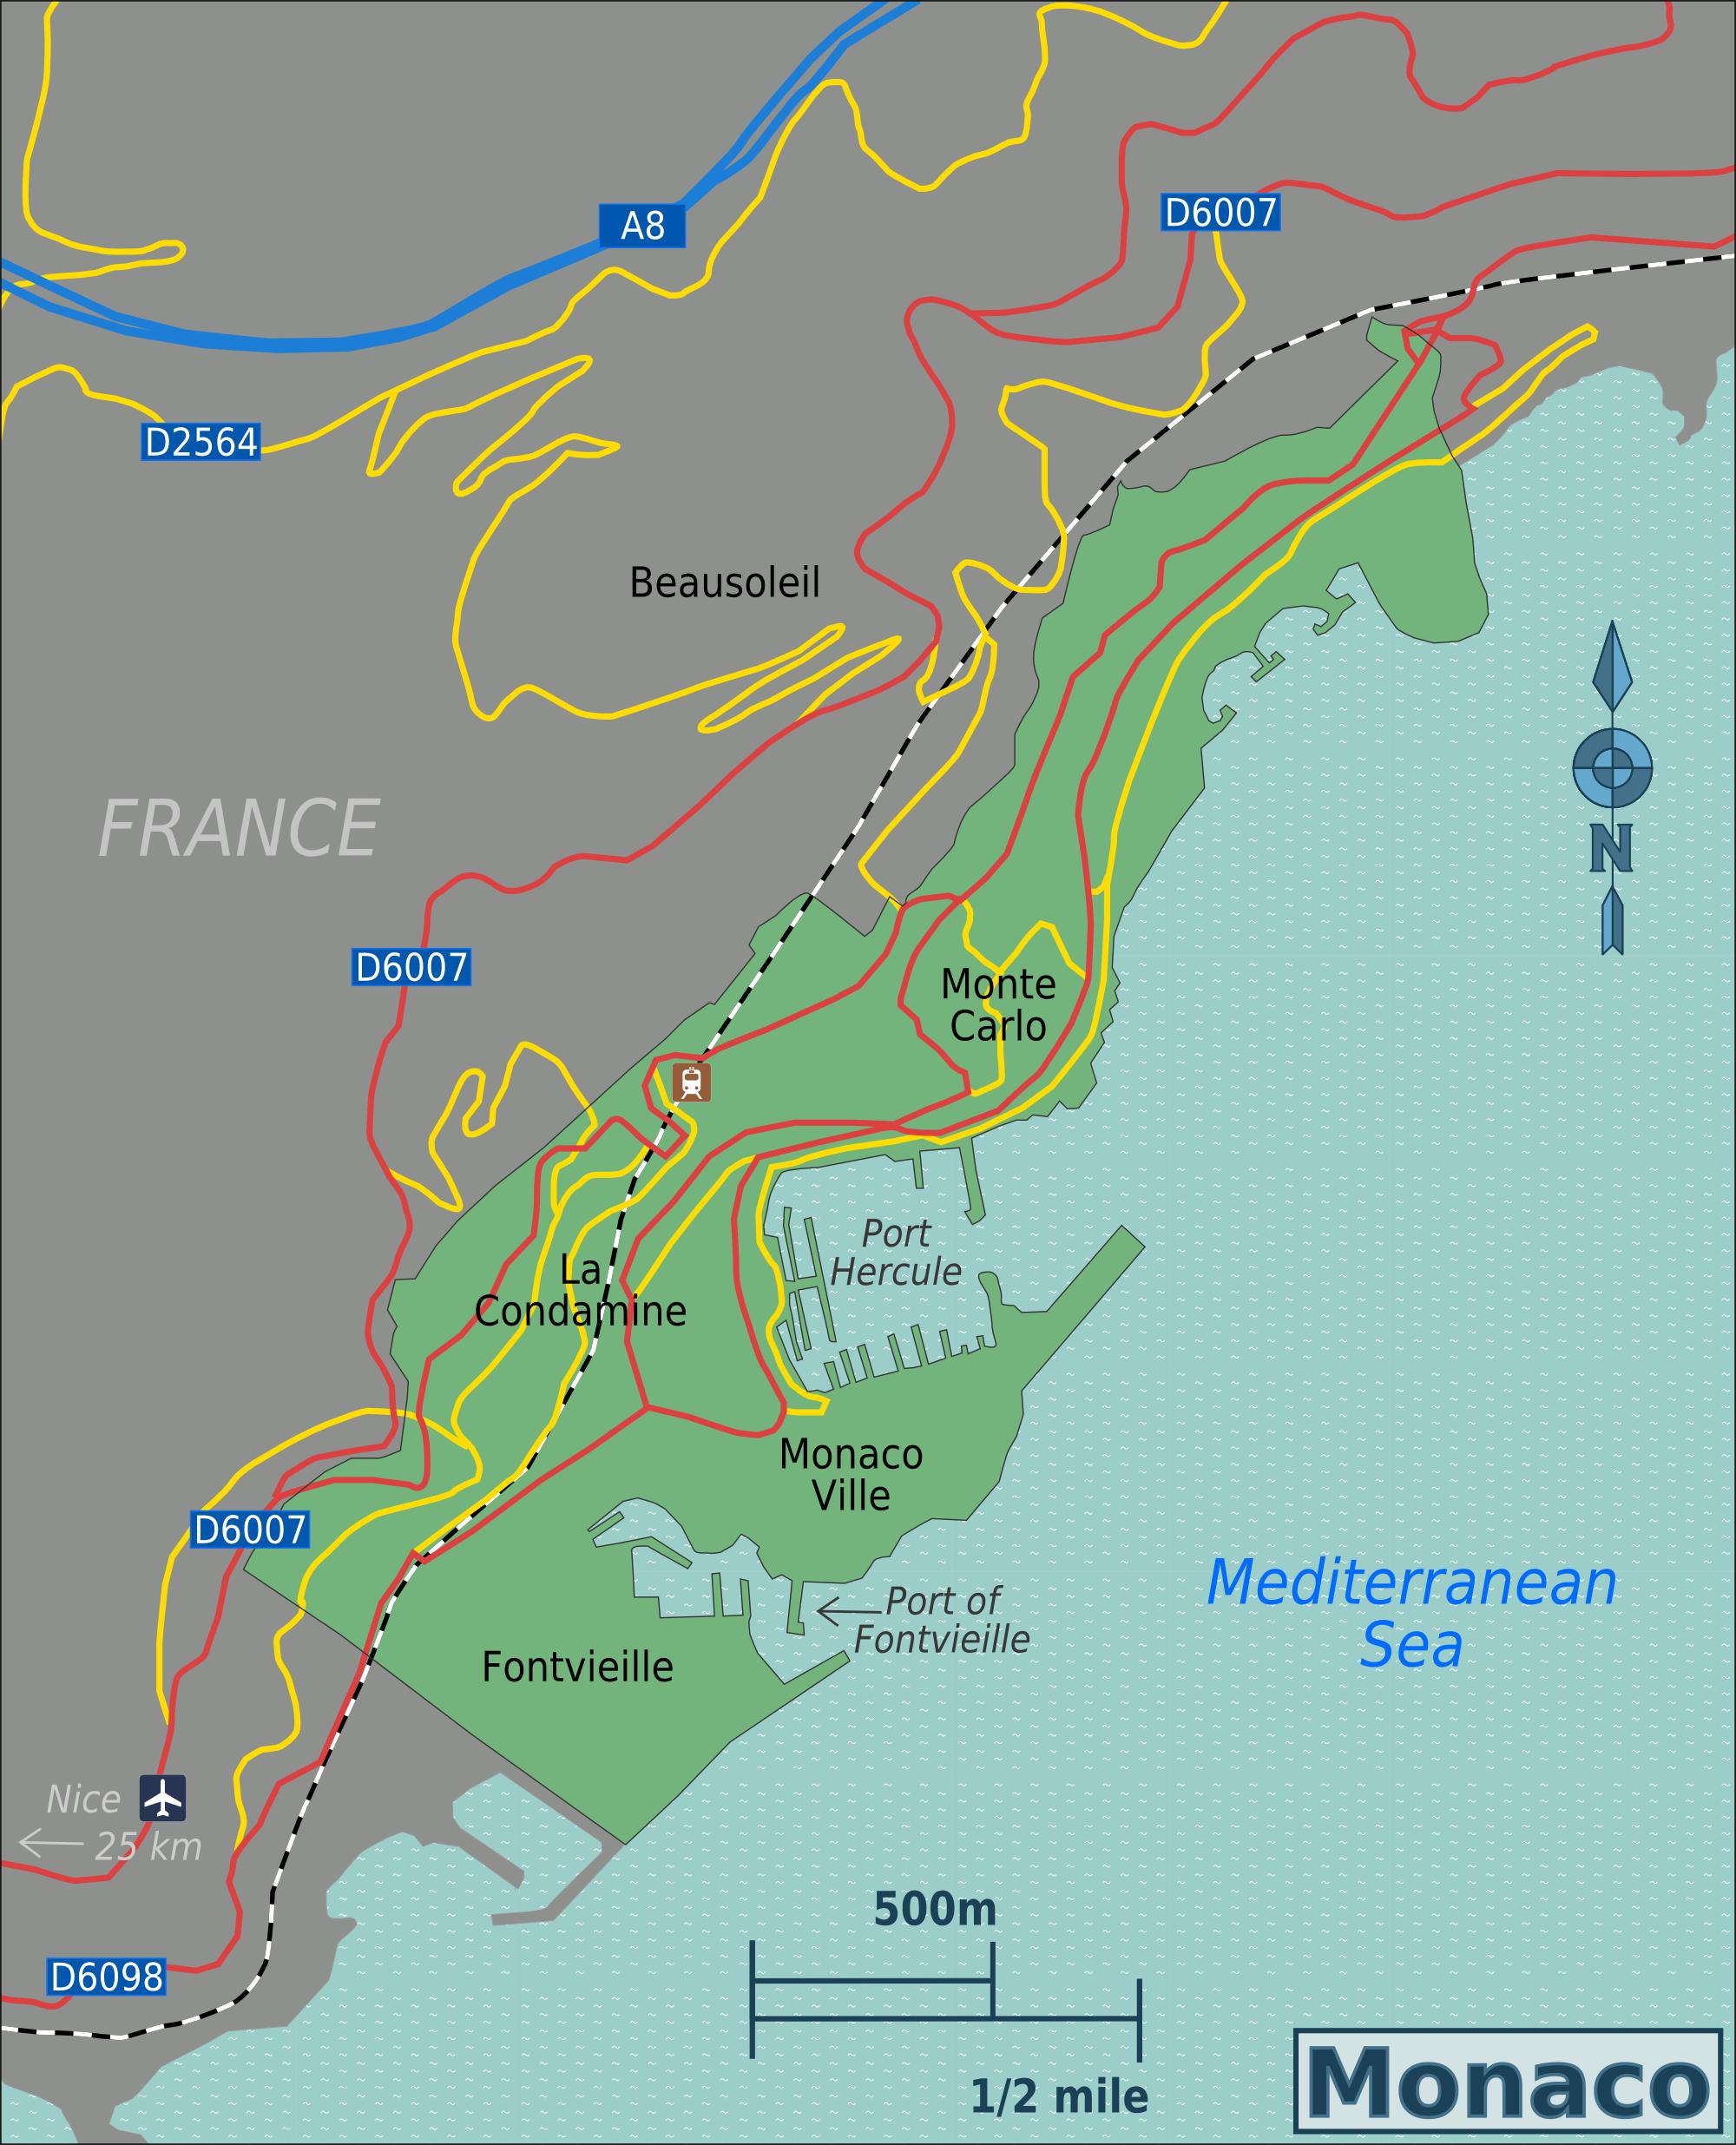 Monaco-Map-3.png